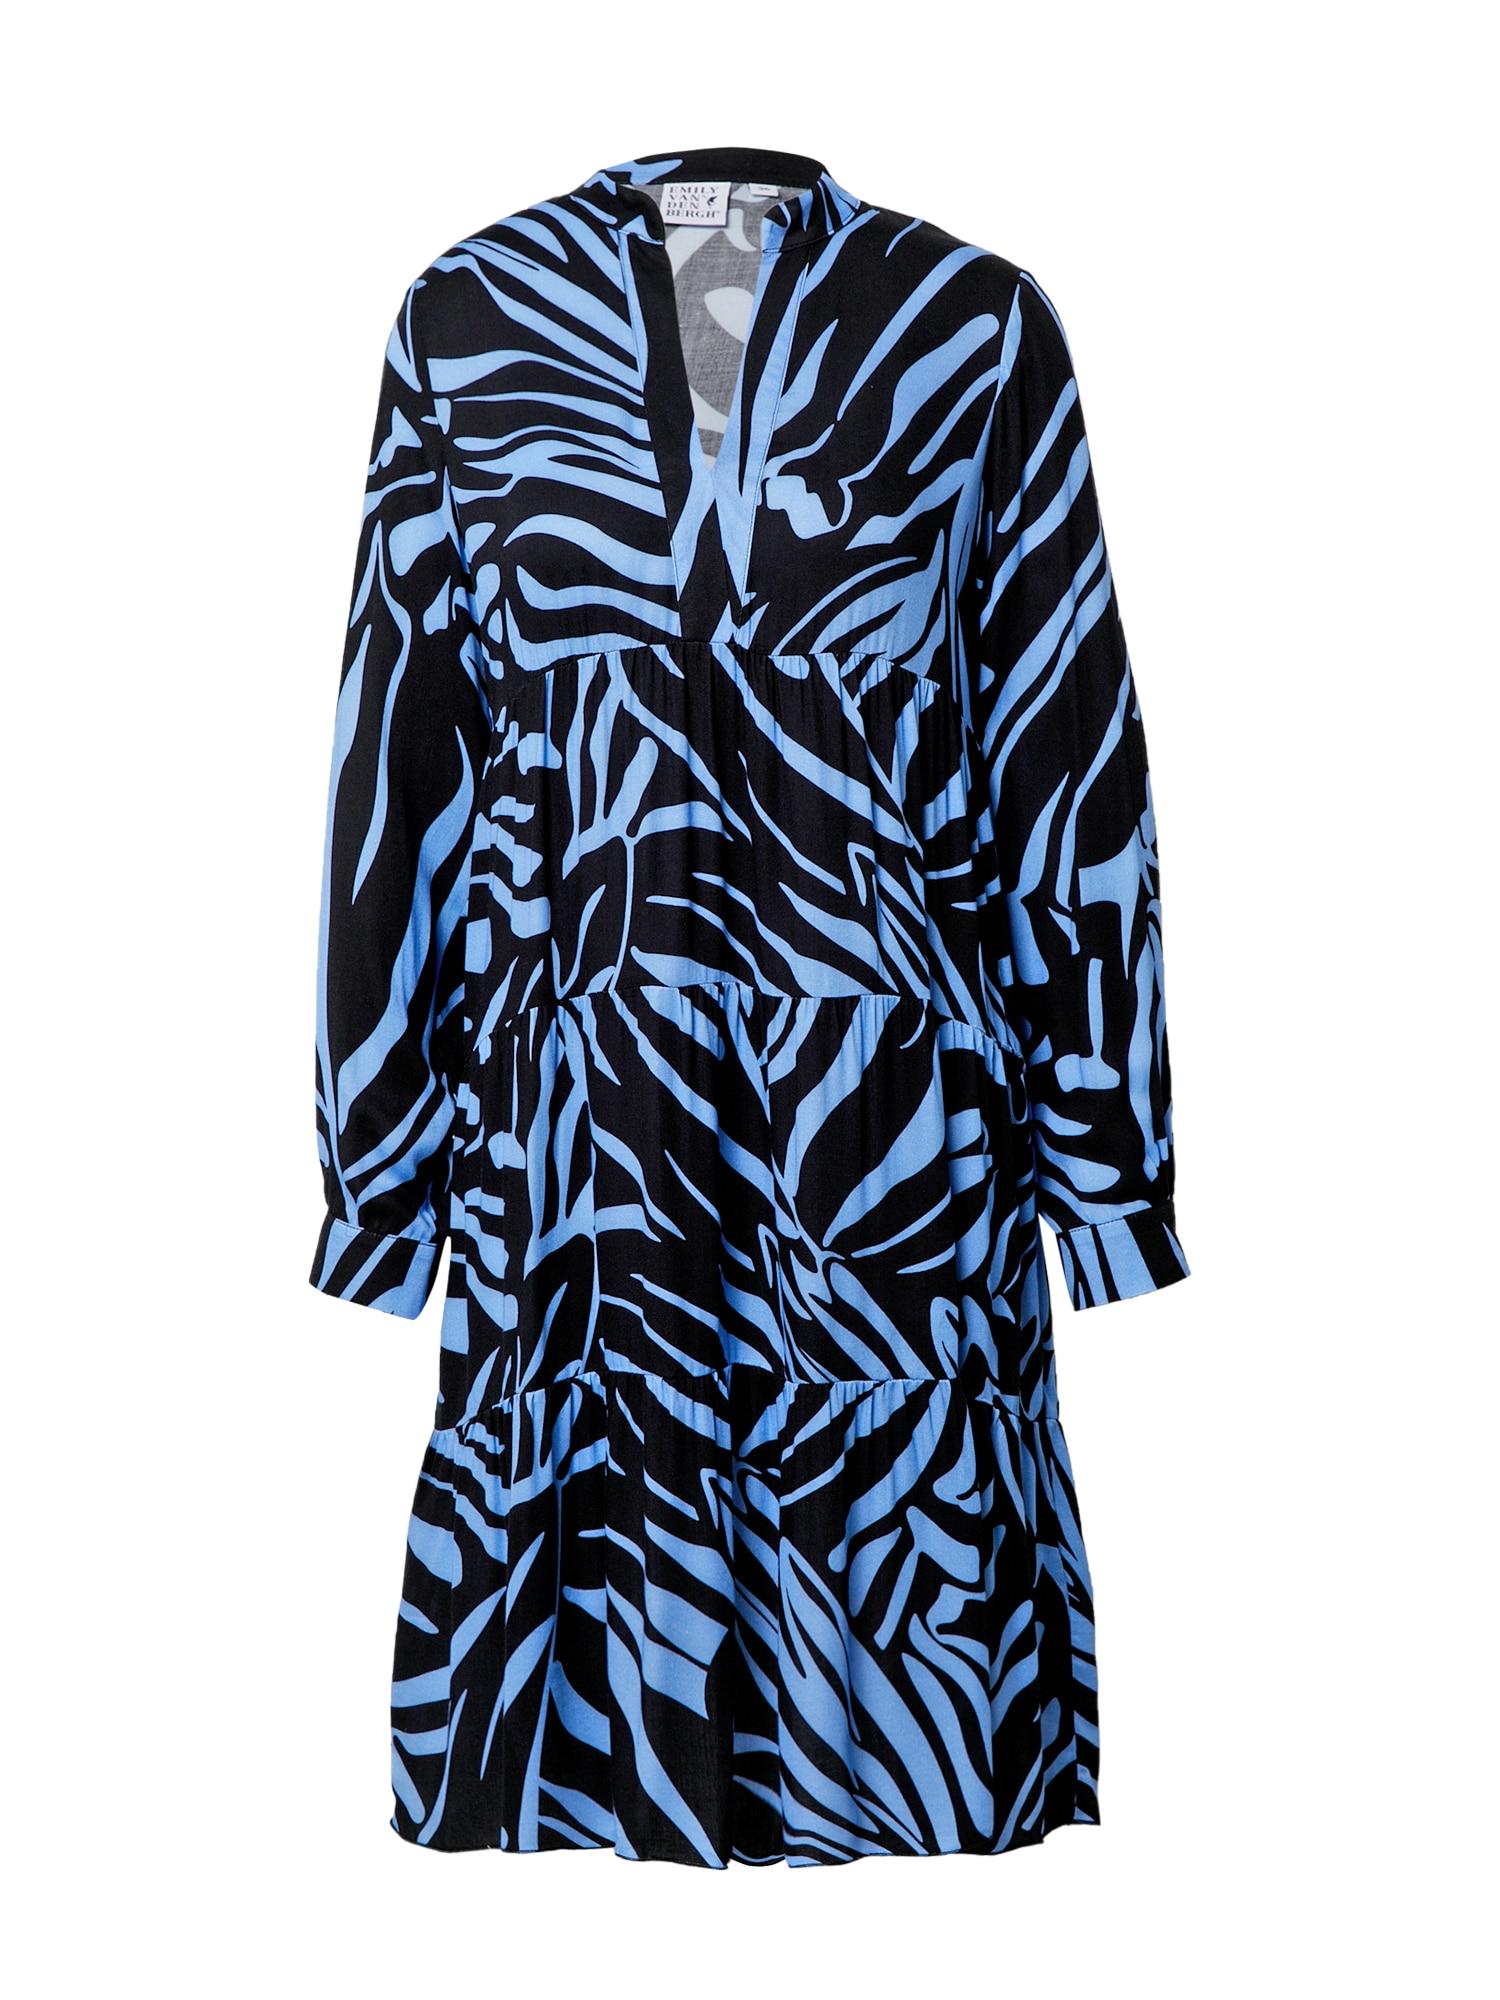 Emily Van Den Bergh Suknelė tamsiai mėlyna / šviesiai mėlyna